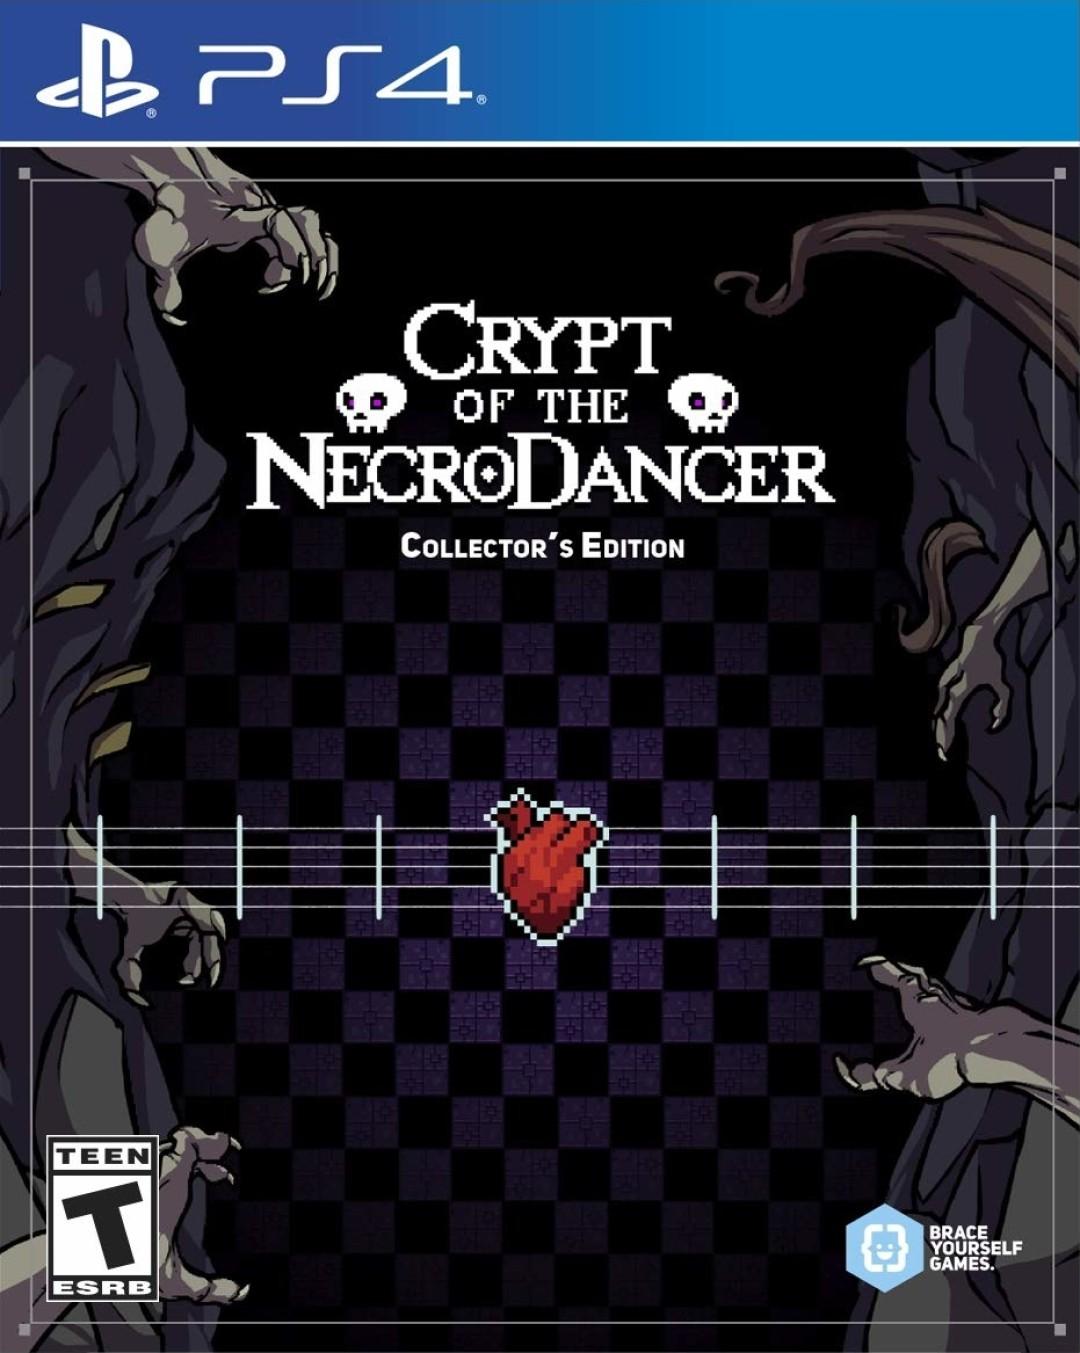 Crypt of the Necrodancer [Collector's Edition]